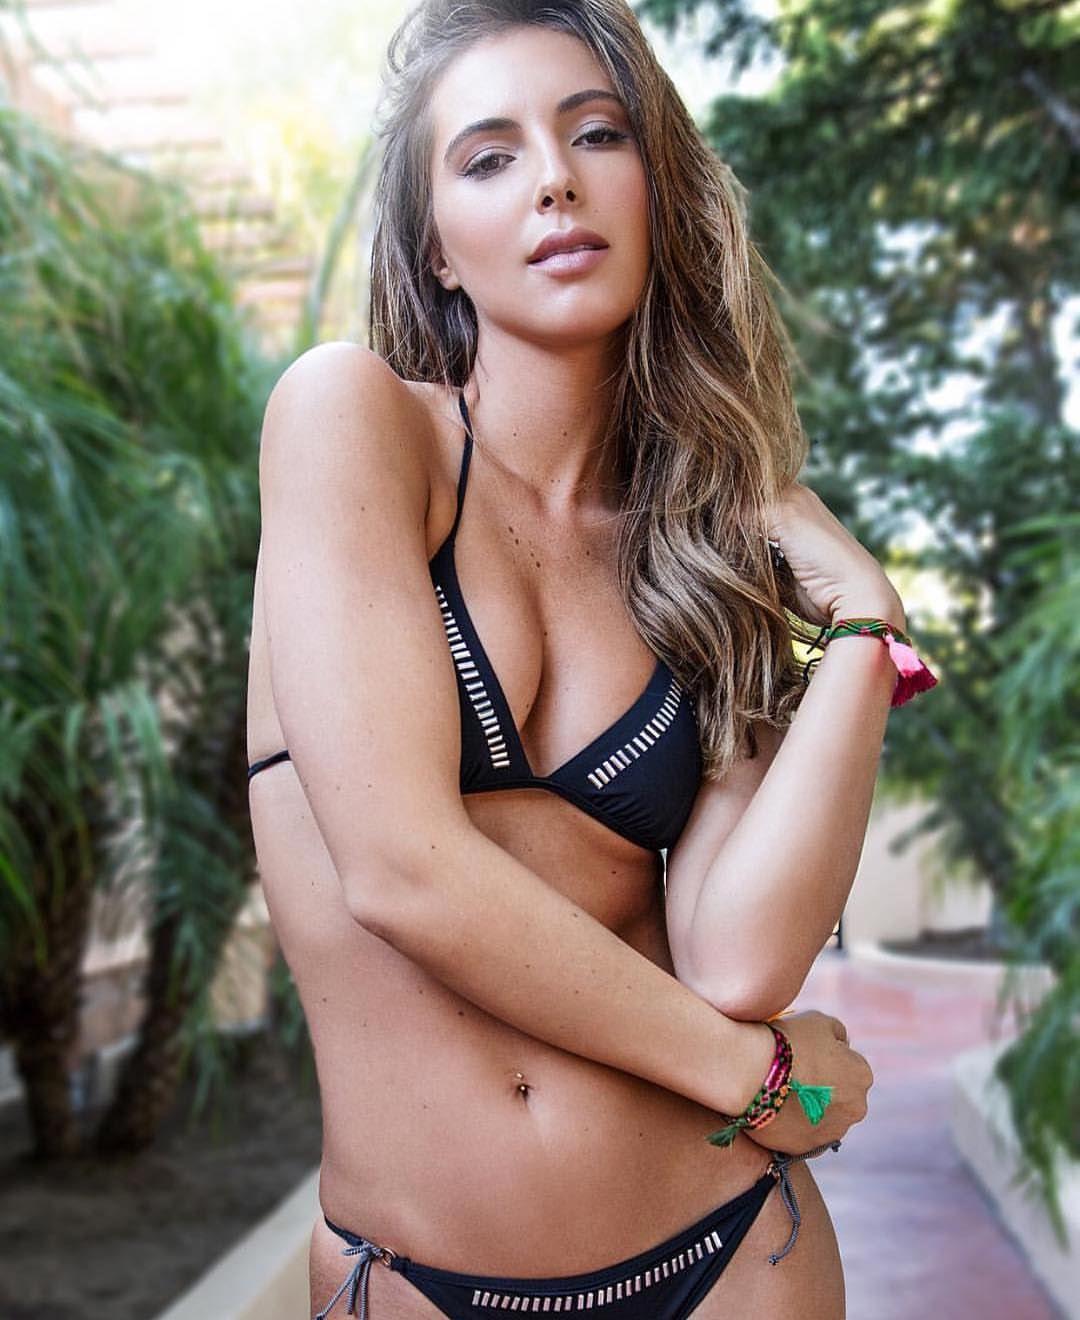 Bikini Brittny Ward naked (48 foto and video), Pussy, Paparazzi, Feet, butt 2015